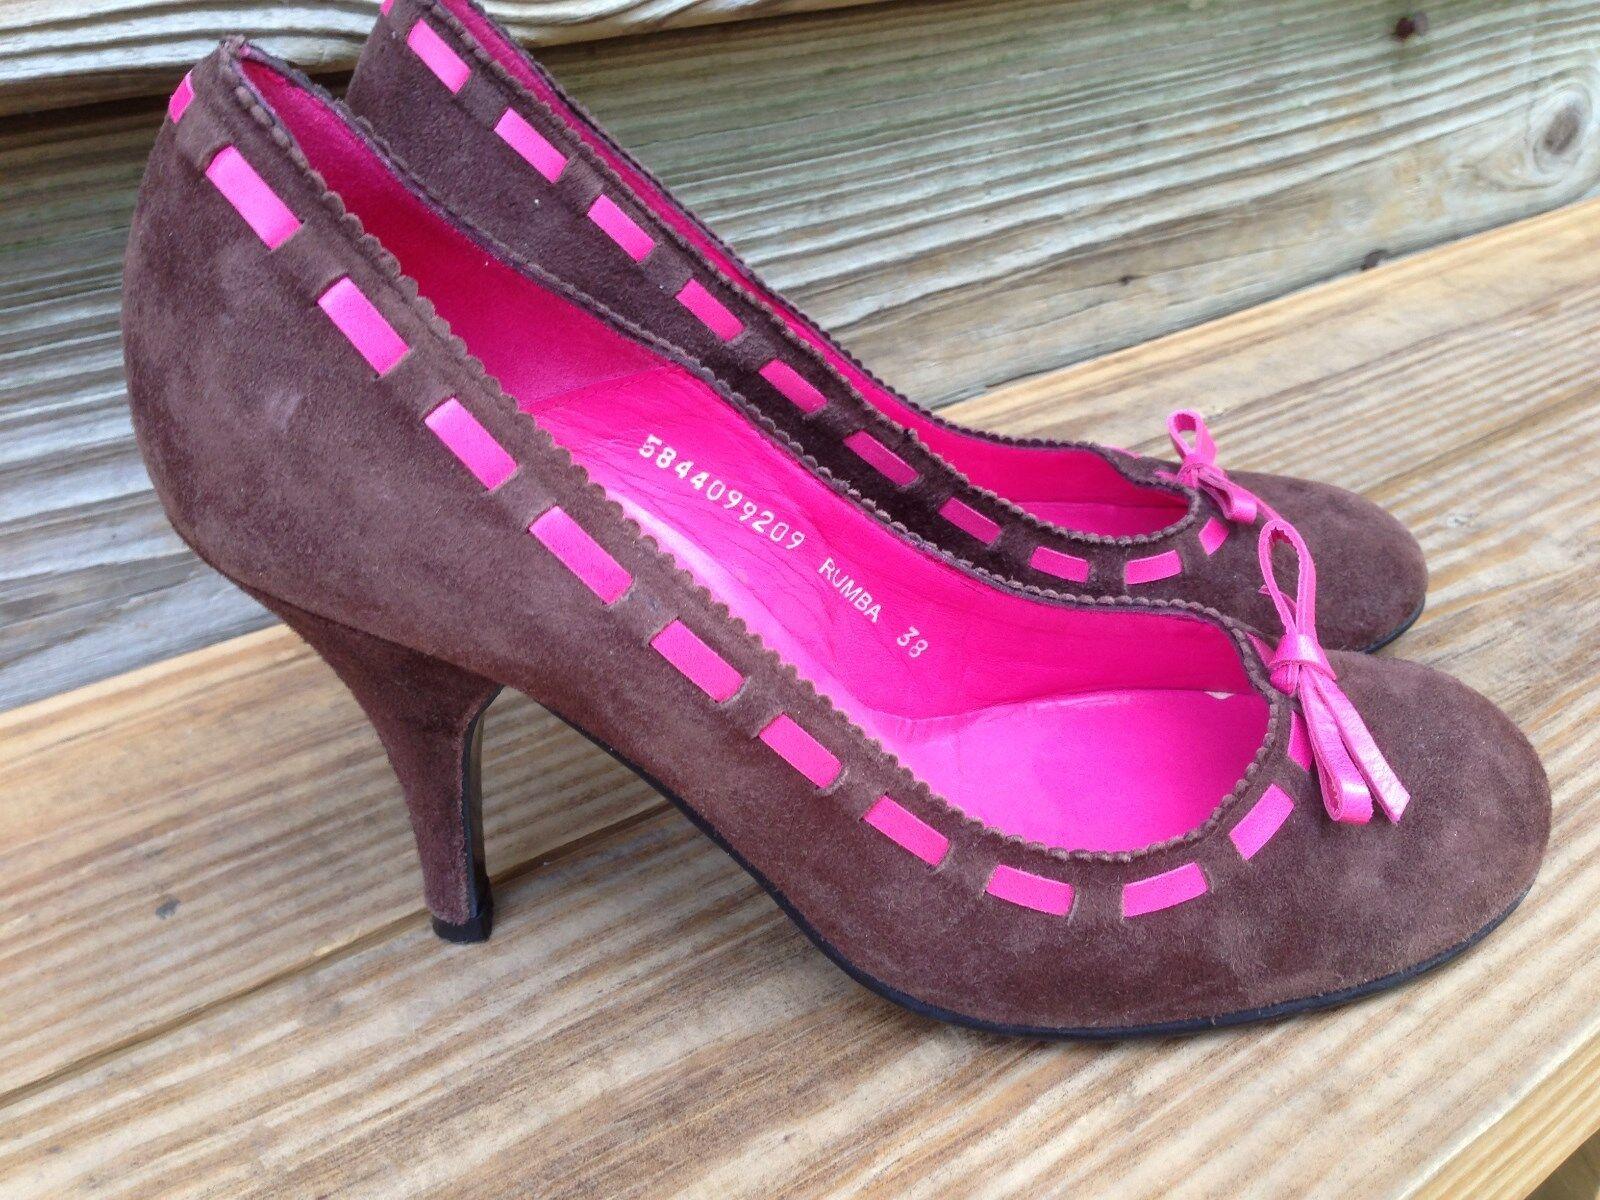 KG kurt geiger femmes pumps chaussures marron suede rose bow rumba  EUR 38 -7.5